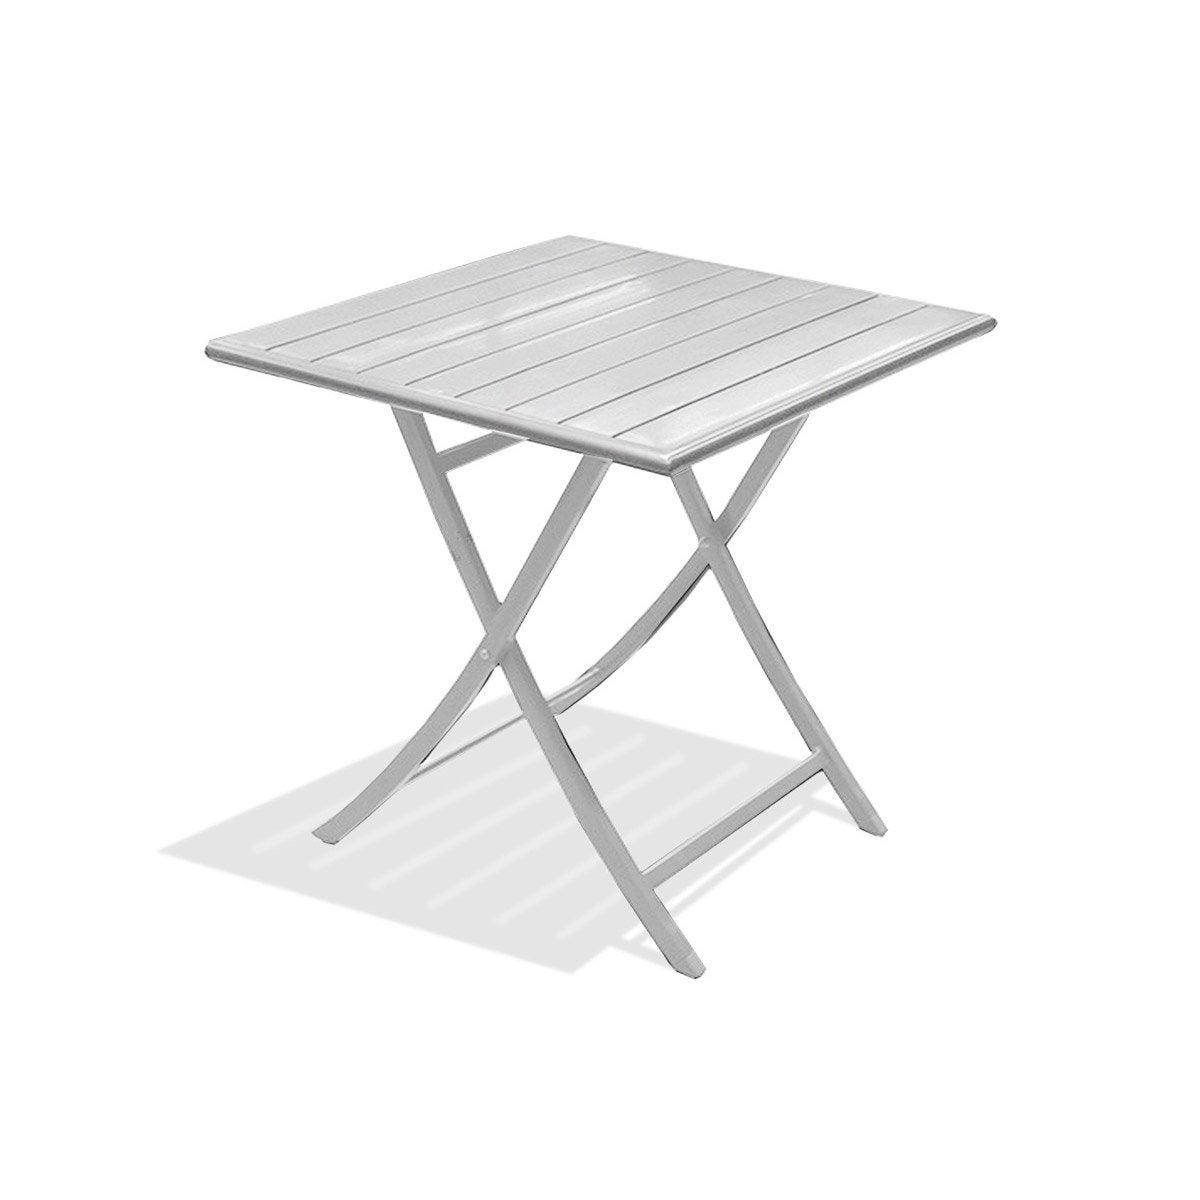 table de jardin marius carr e gris m tal 2 personnes leroy merlin. Black Bedroom Furniture Sets. Home Design Ideas